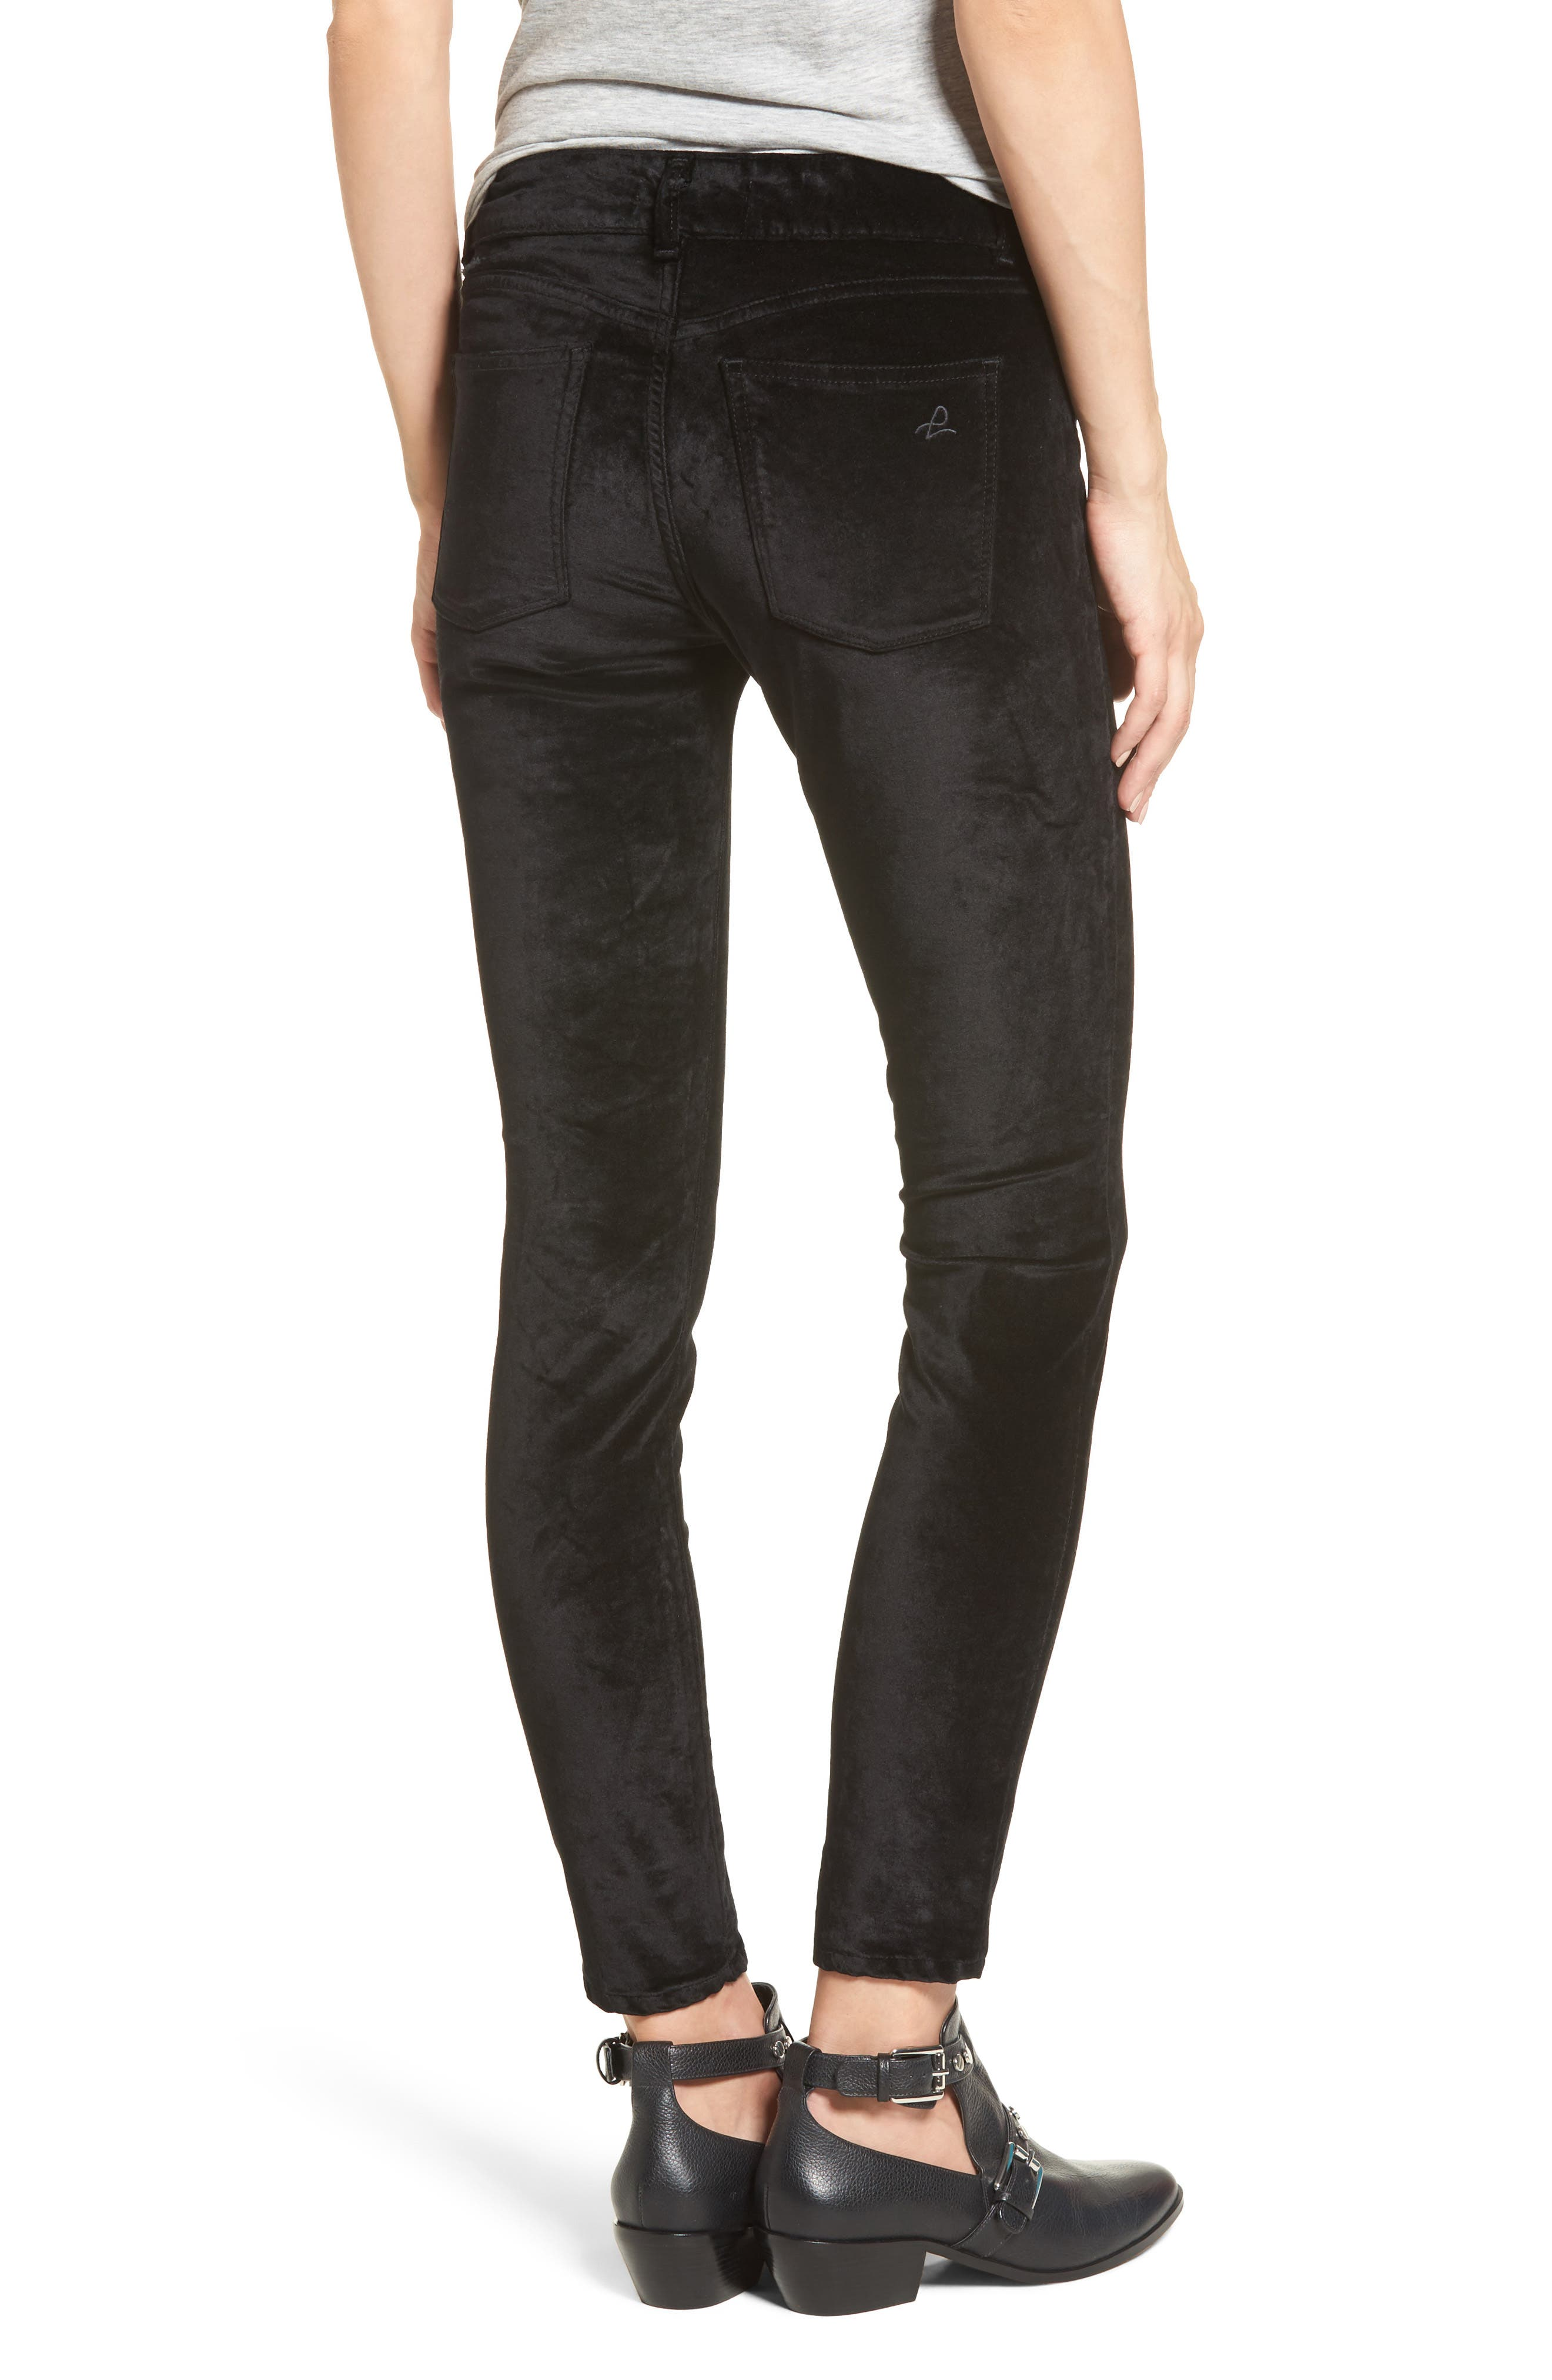 Alternate Image 2  - DL1961 Emma Power Legging Jeans (Jet Black)